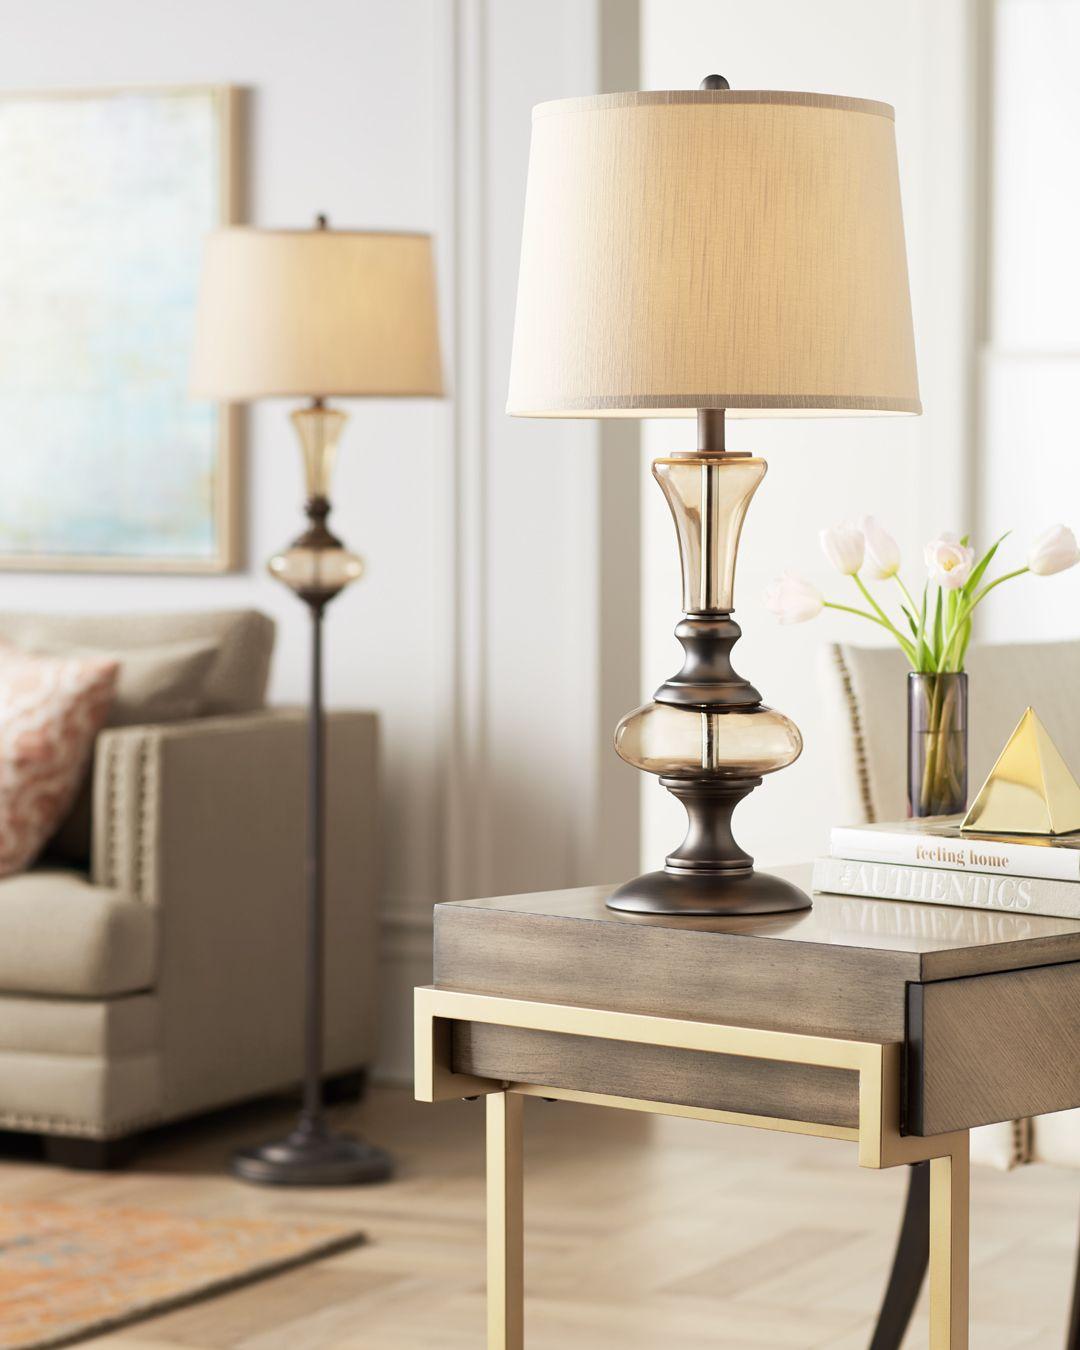 Olive Glow Matching Table Floor Lamp Floor Lamp Table Floor